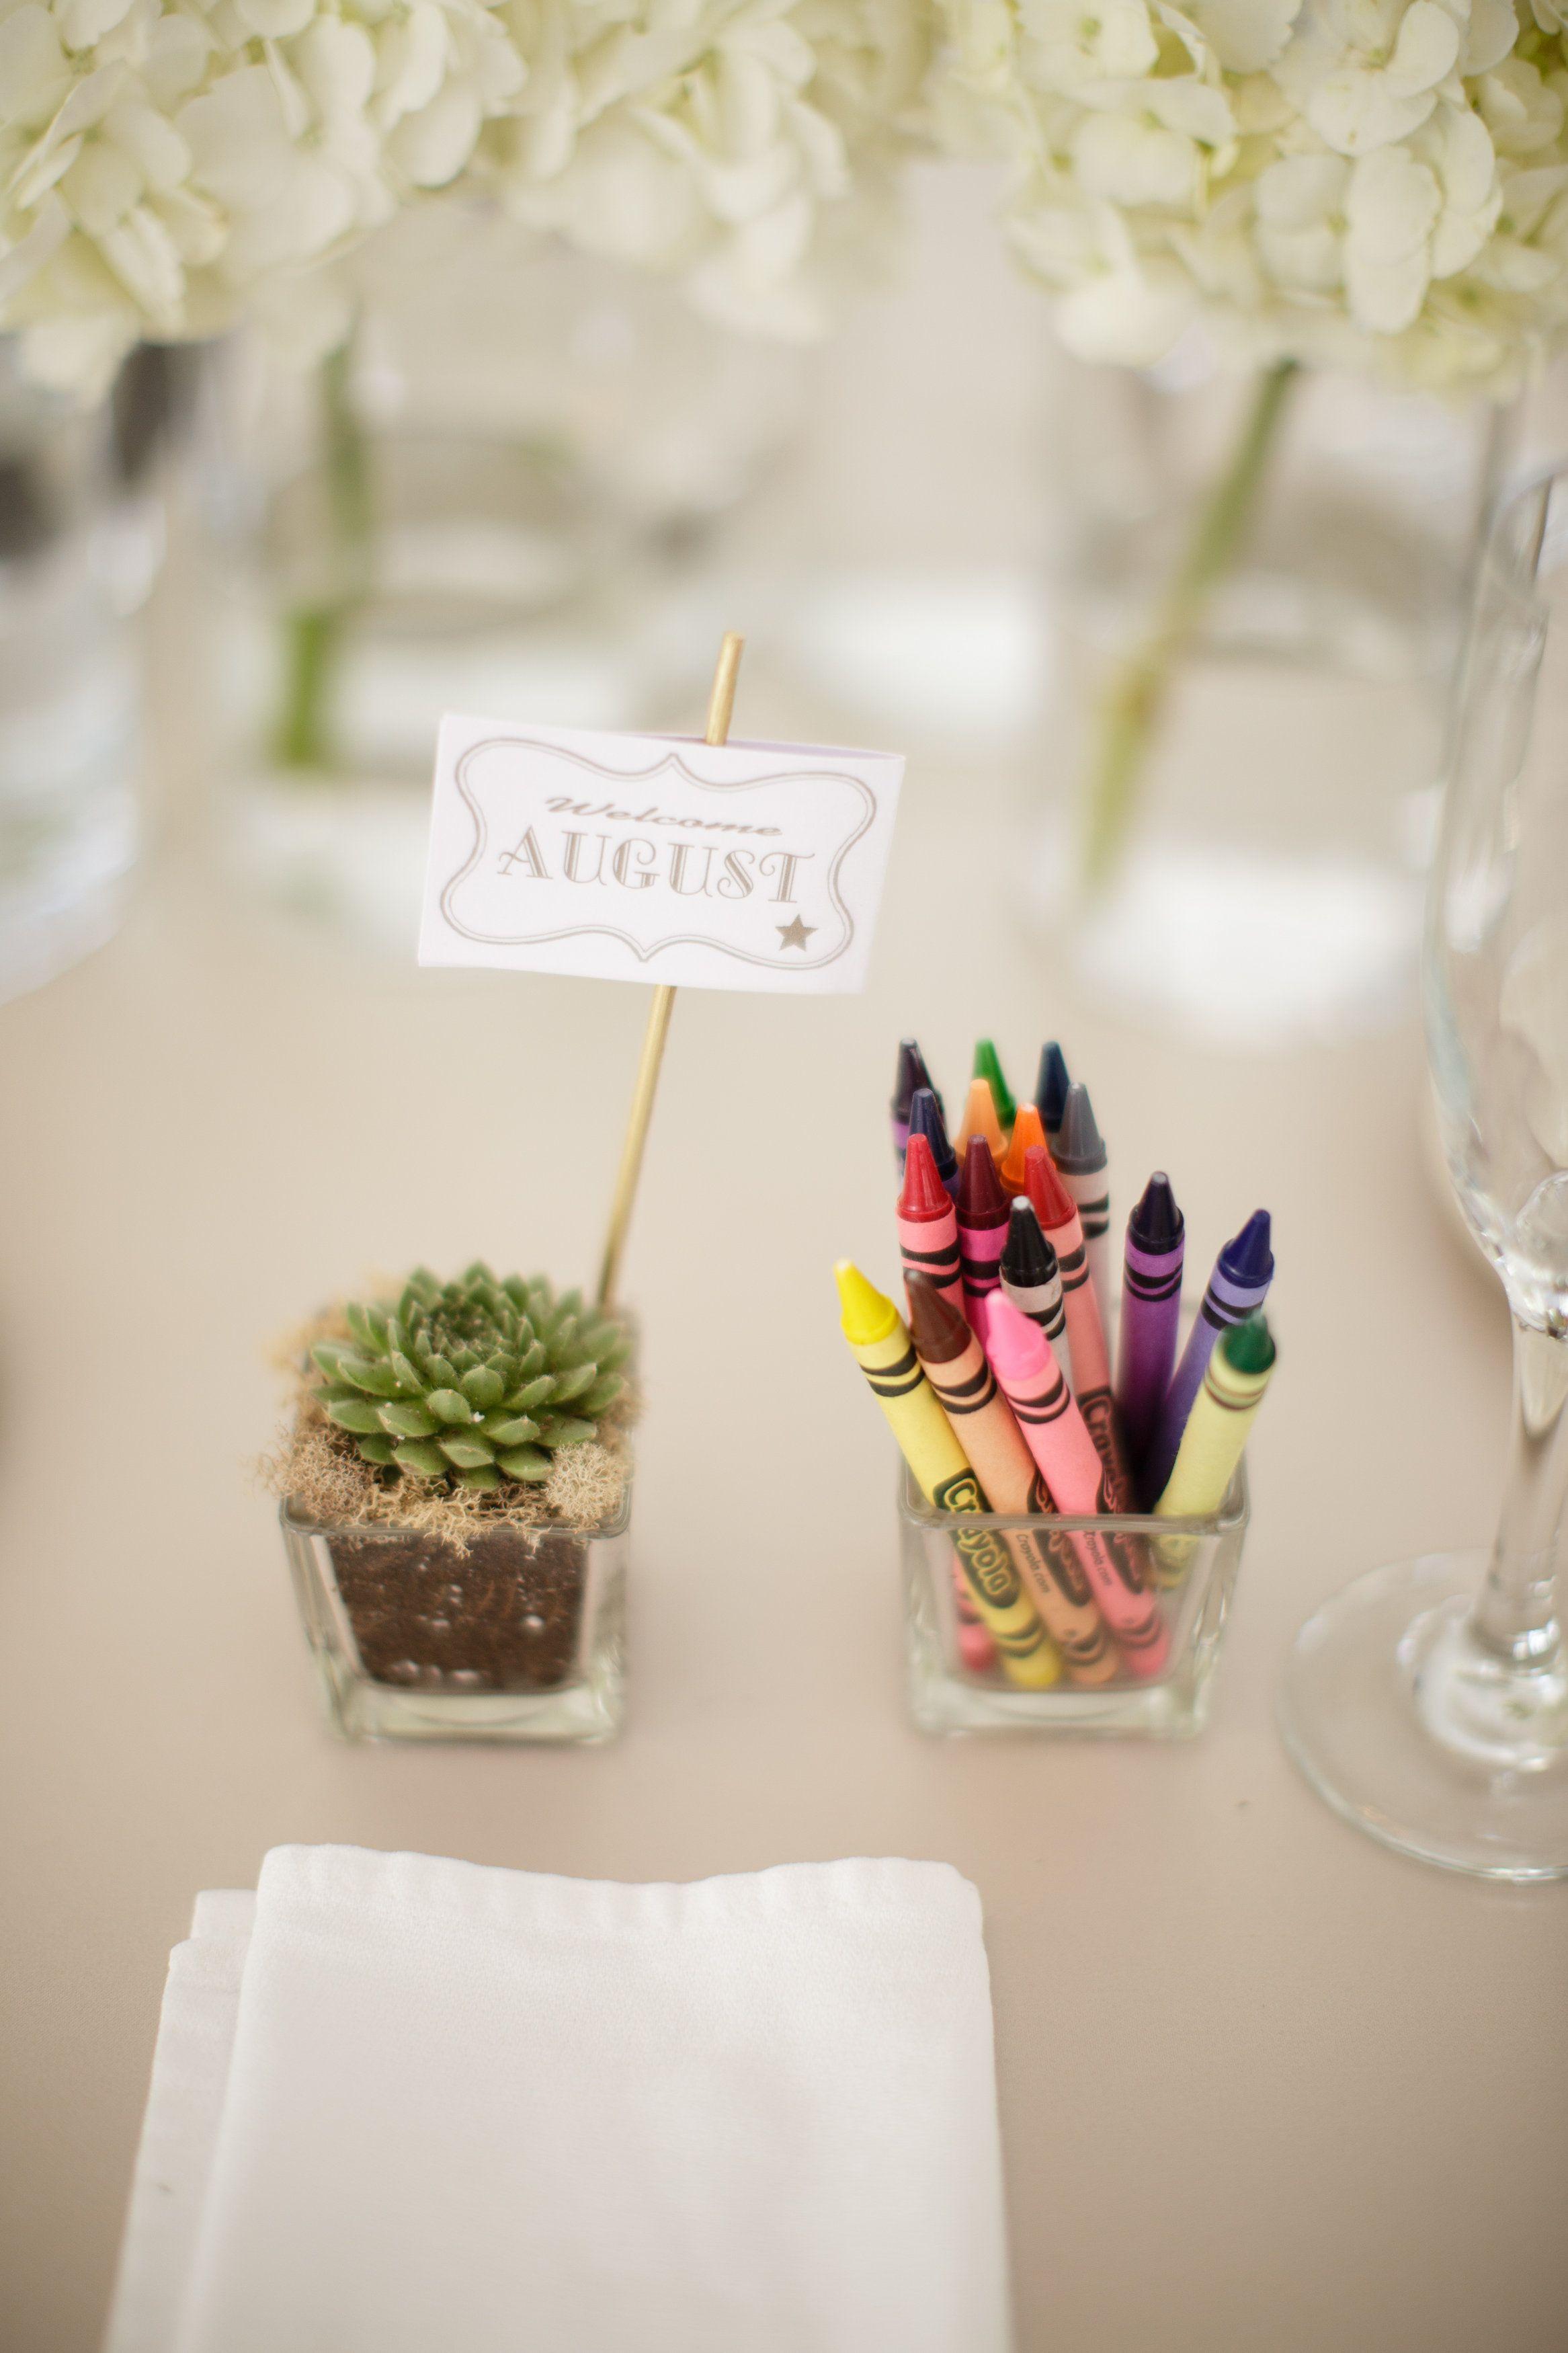 DIY wedding favor succulent place card - ring bearer | DIY Wedding ...